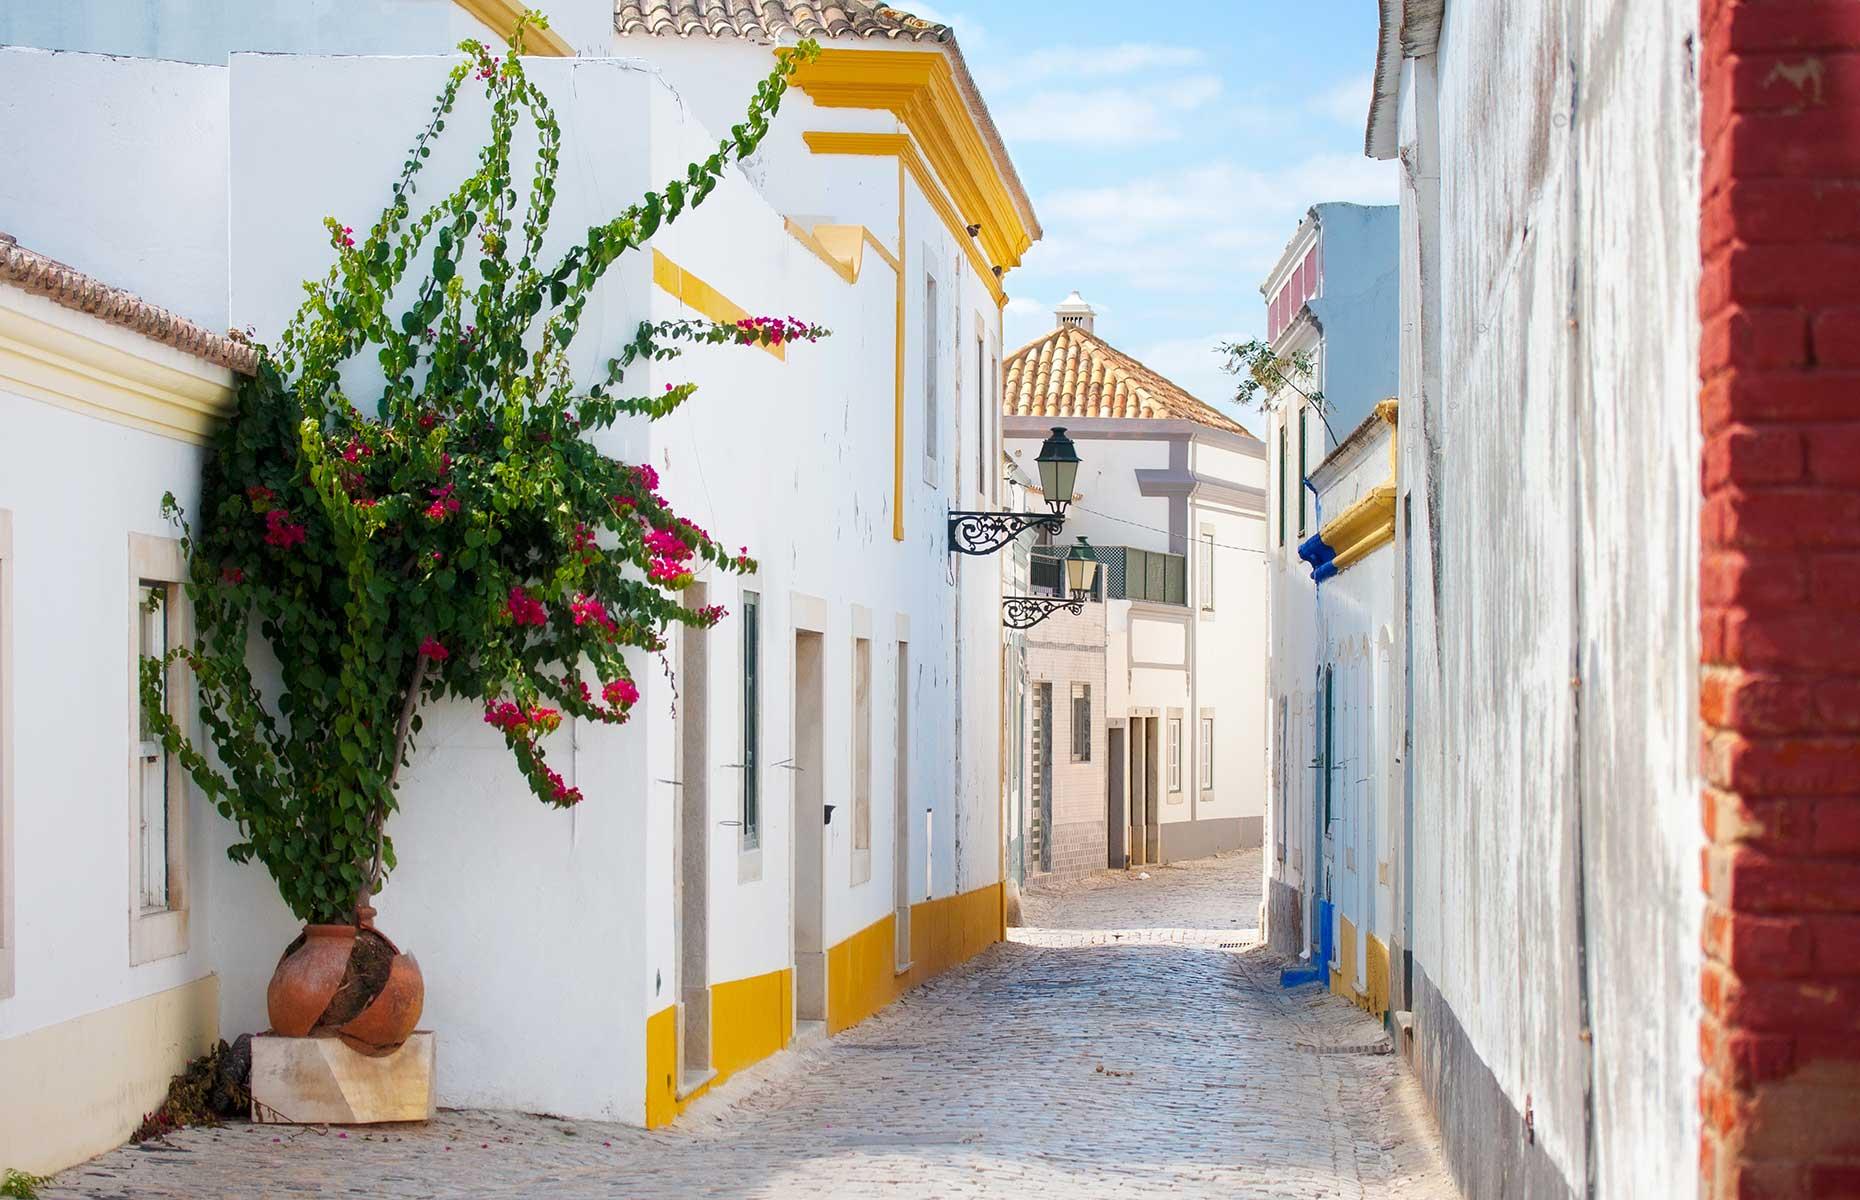 Faro Old Town (Image: aniad/Shutterstock)